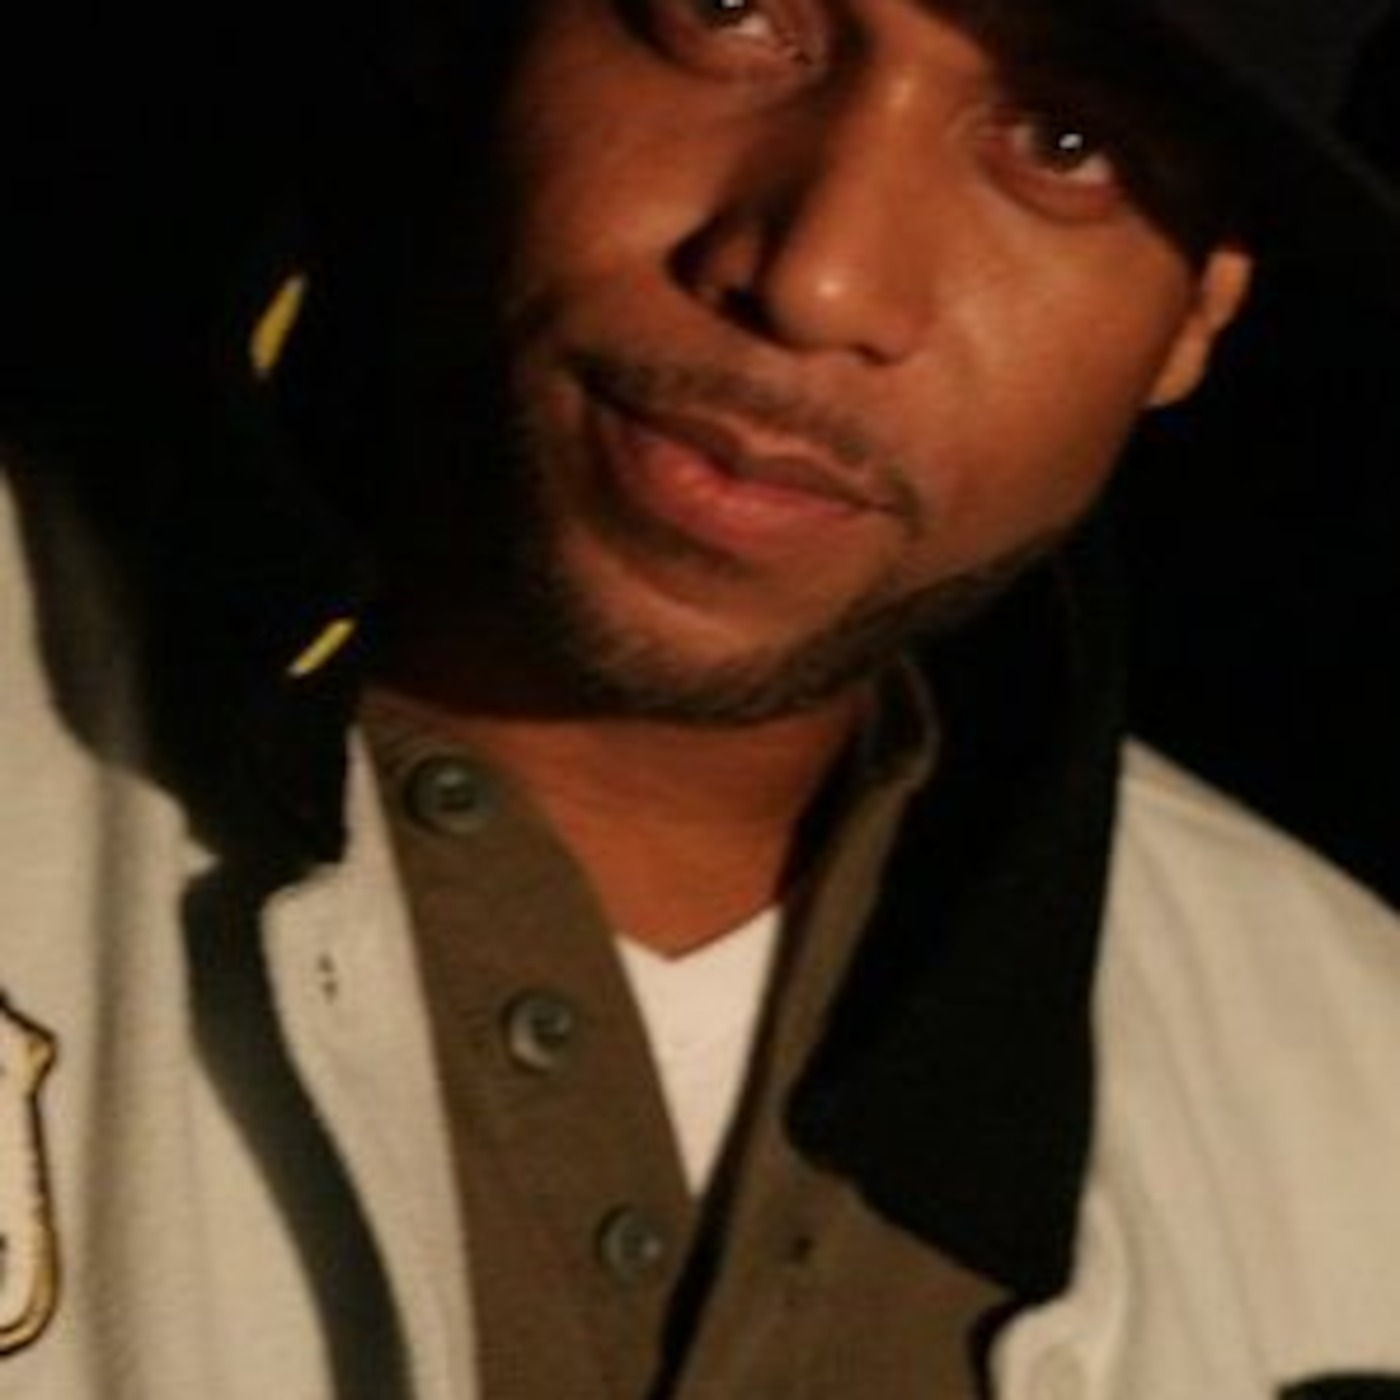 Omar Johnson's Sol 4 Soul Podcast